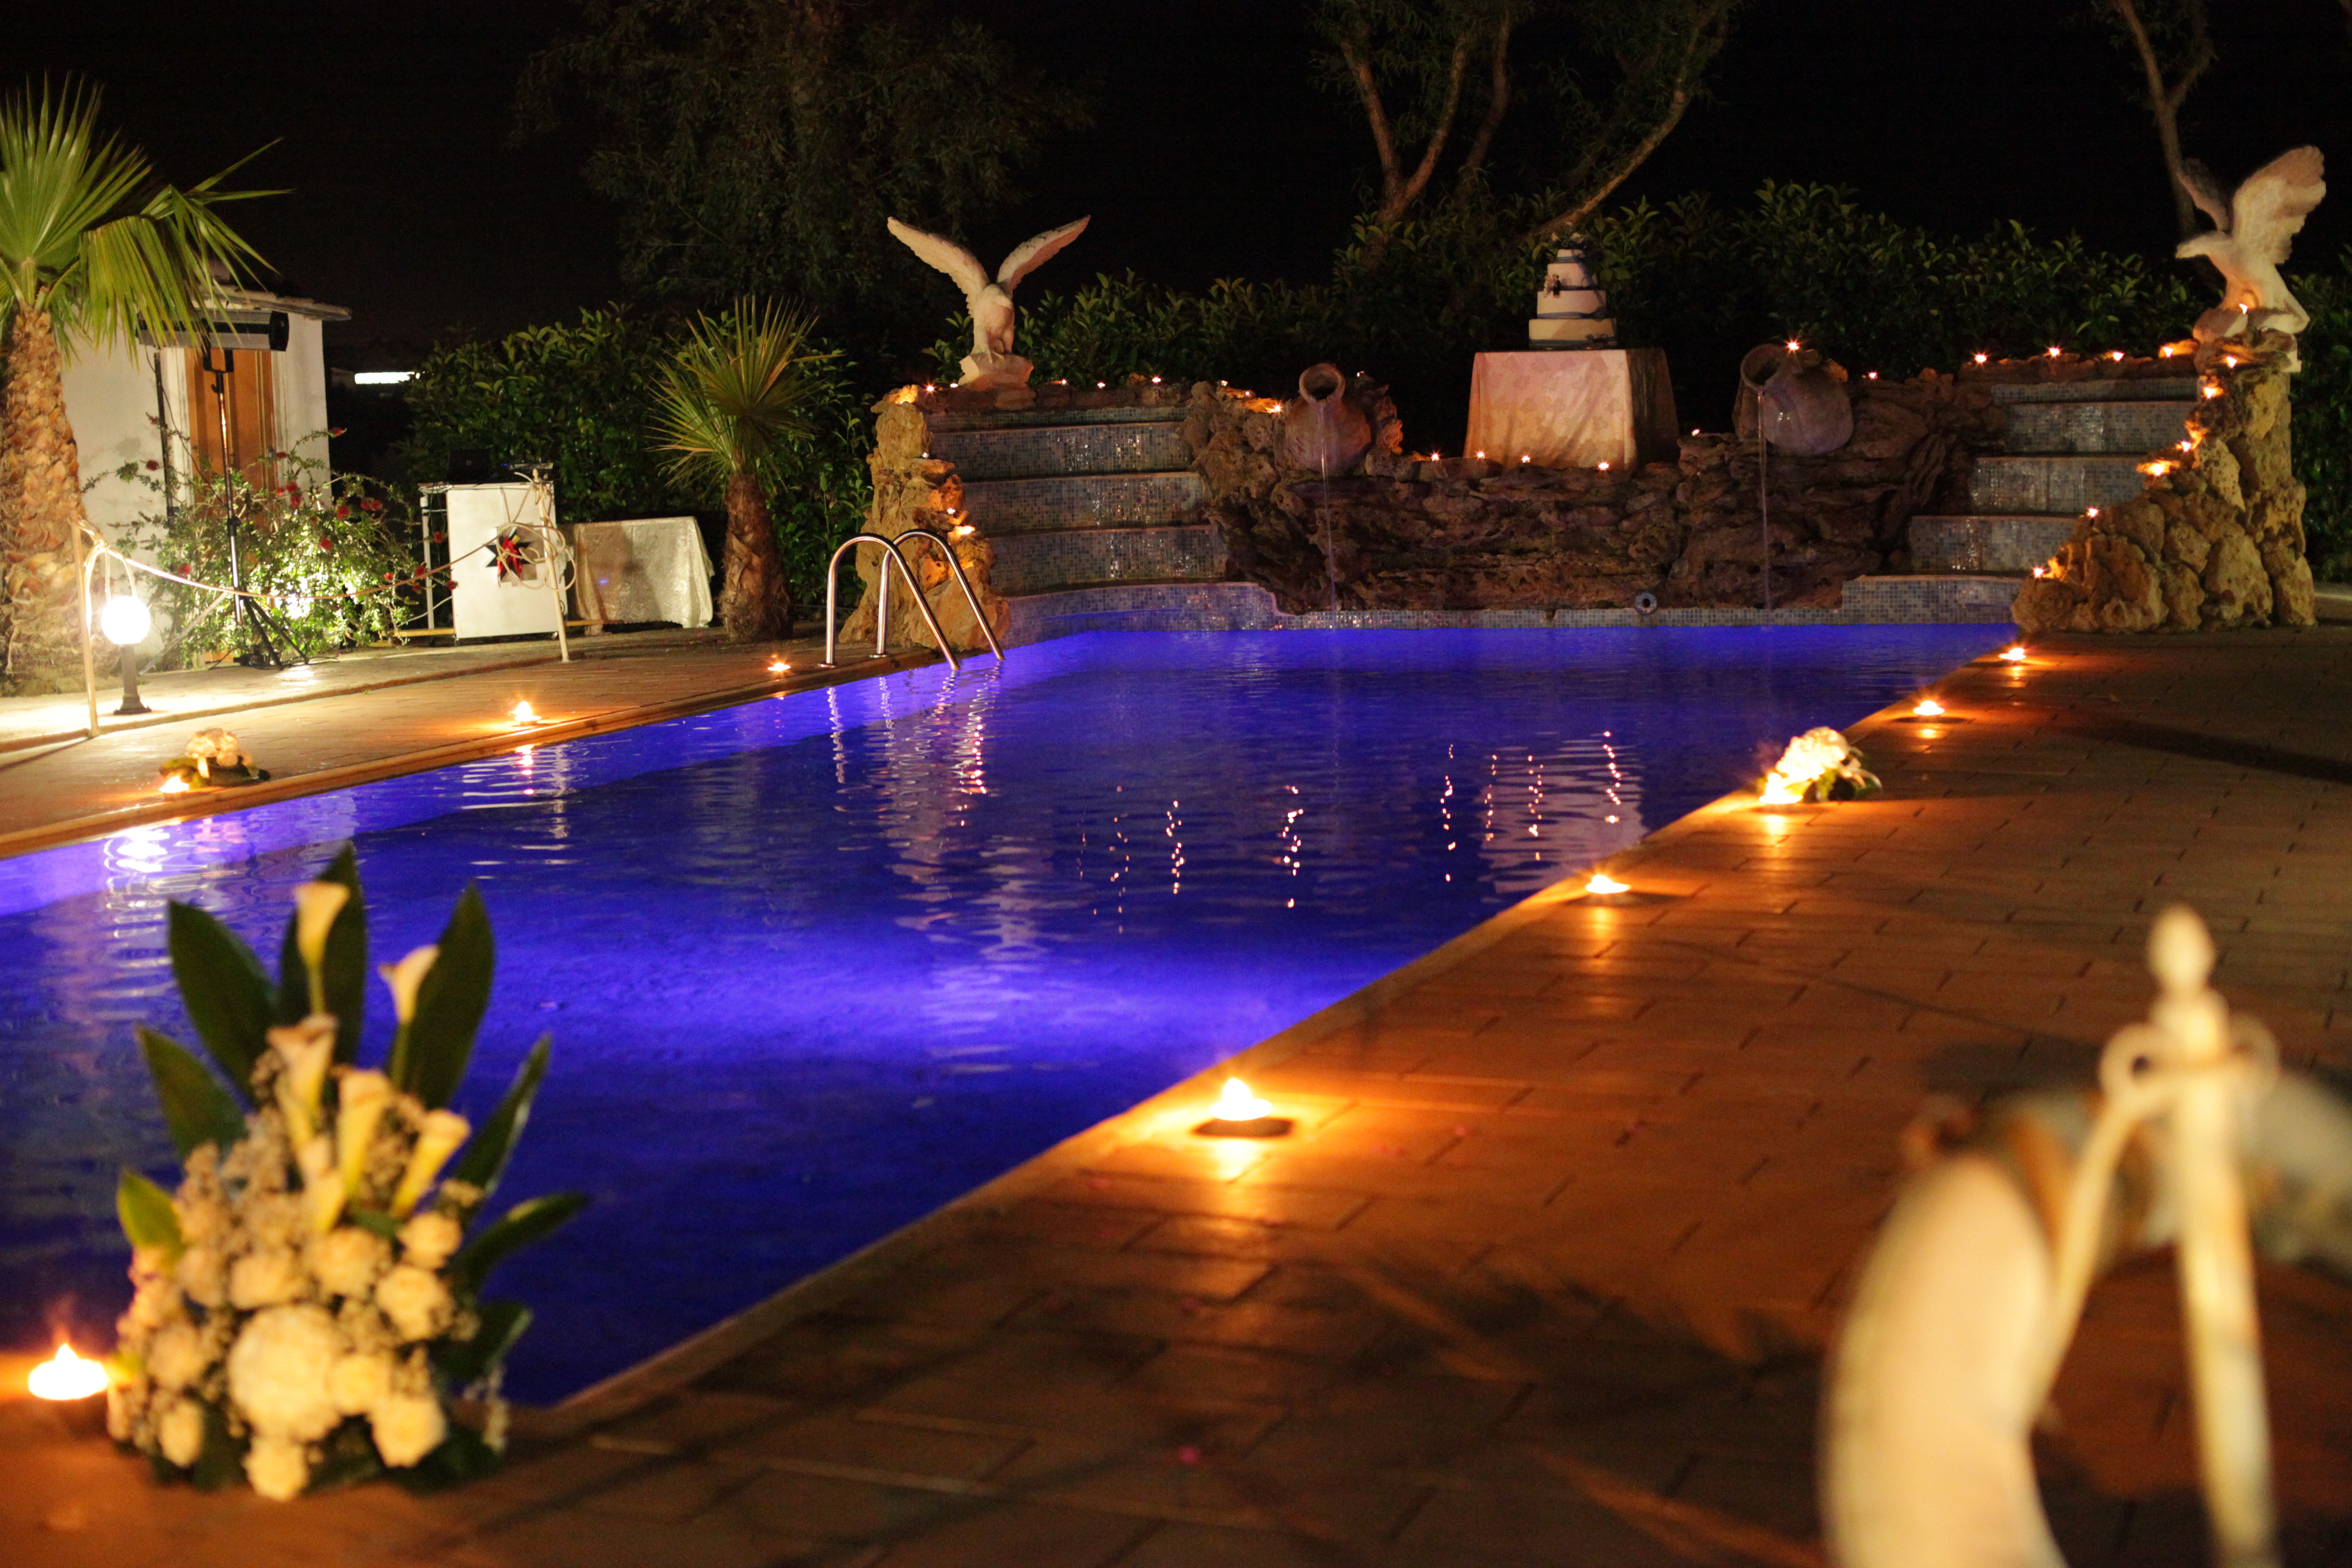 Benvenuti a Villa Tegolino!